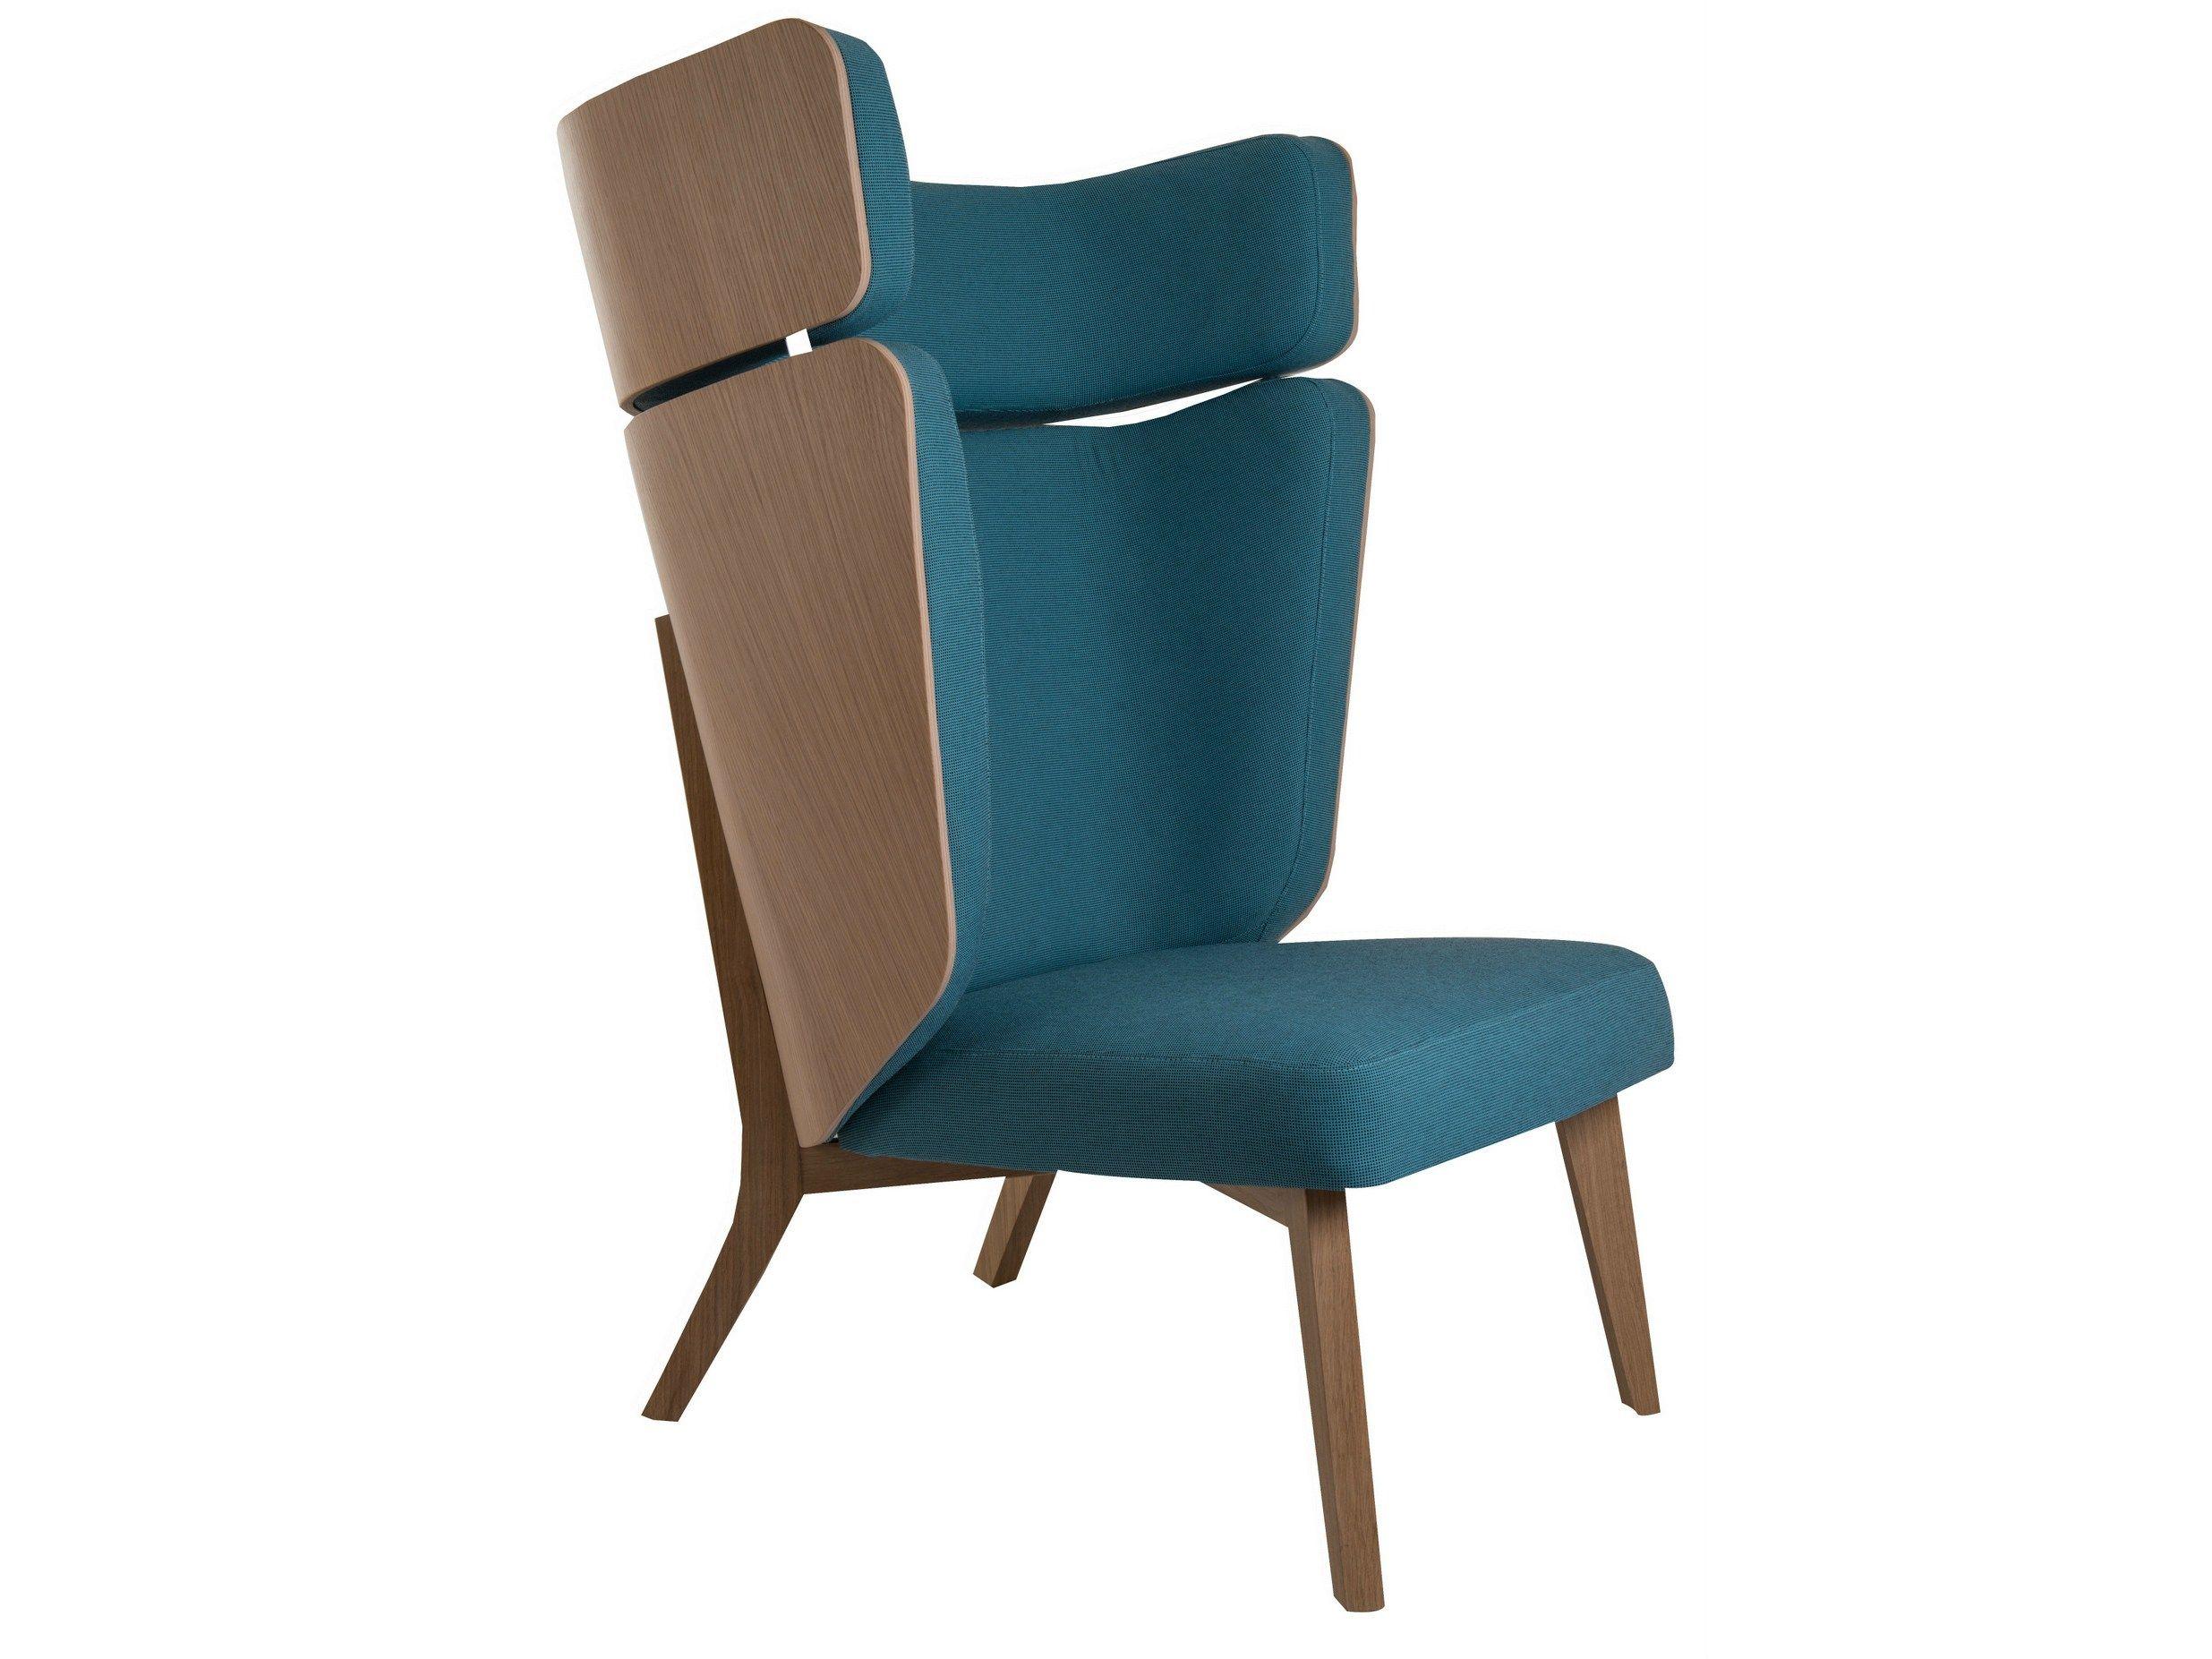 Sedie Schienale Alto Design : Hayworth sedia italy dream design